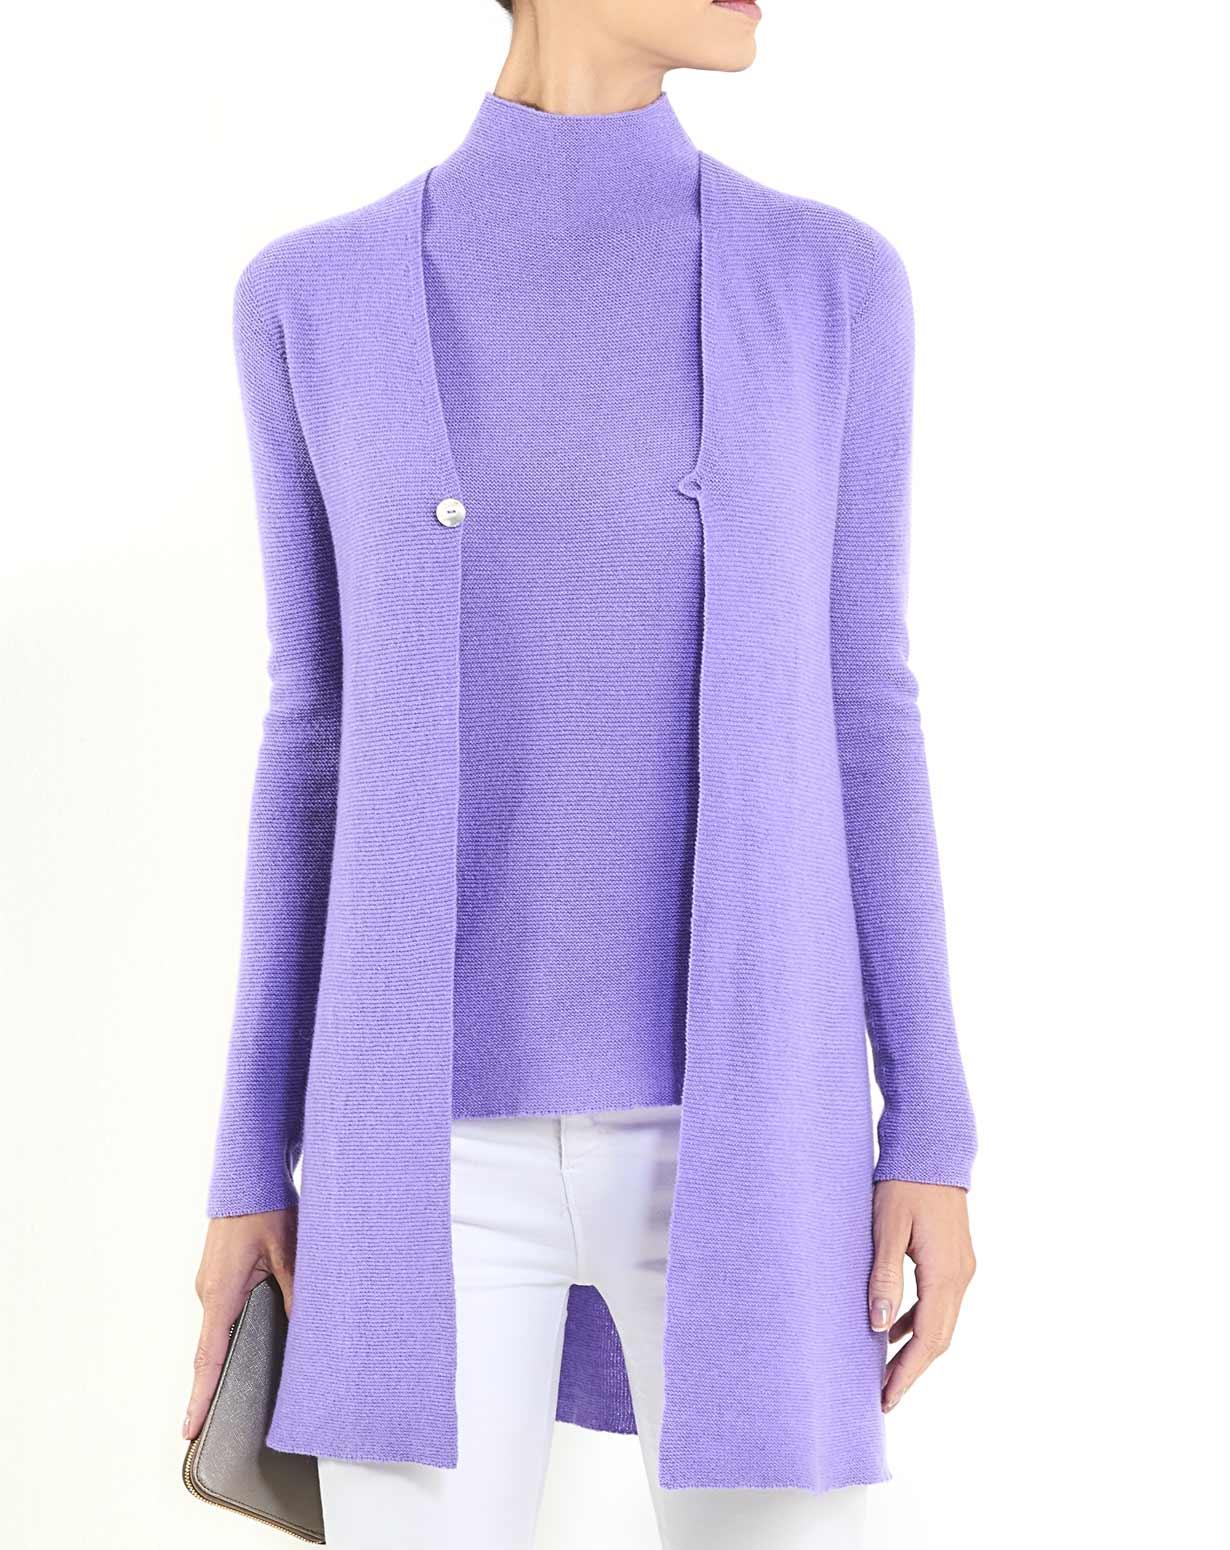 Women's Cashmere Links Stitch Duster Cardigan | MaisonCashmere